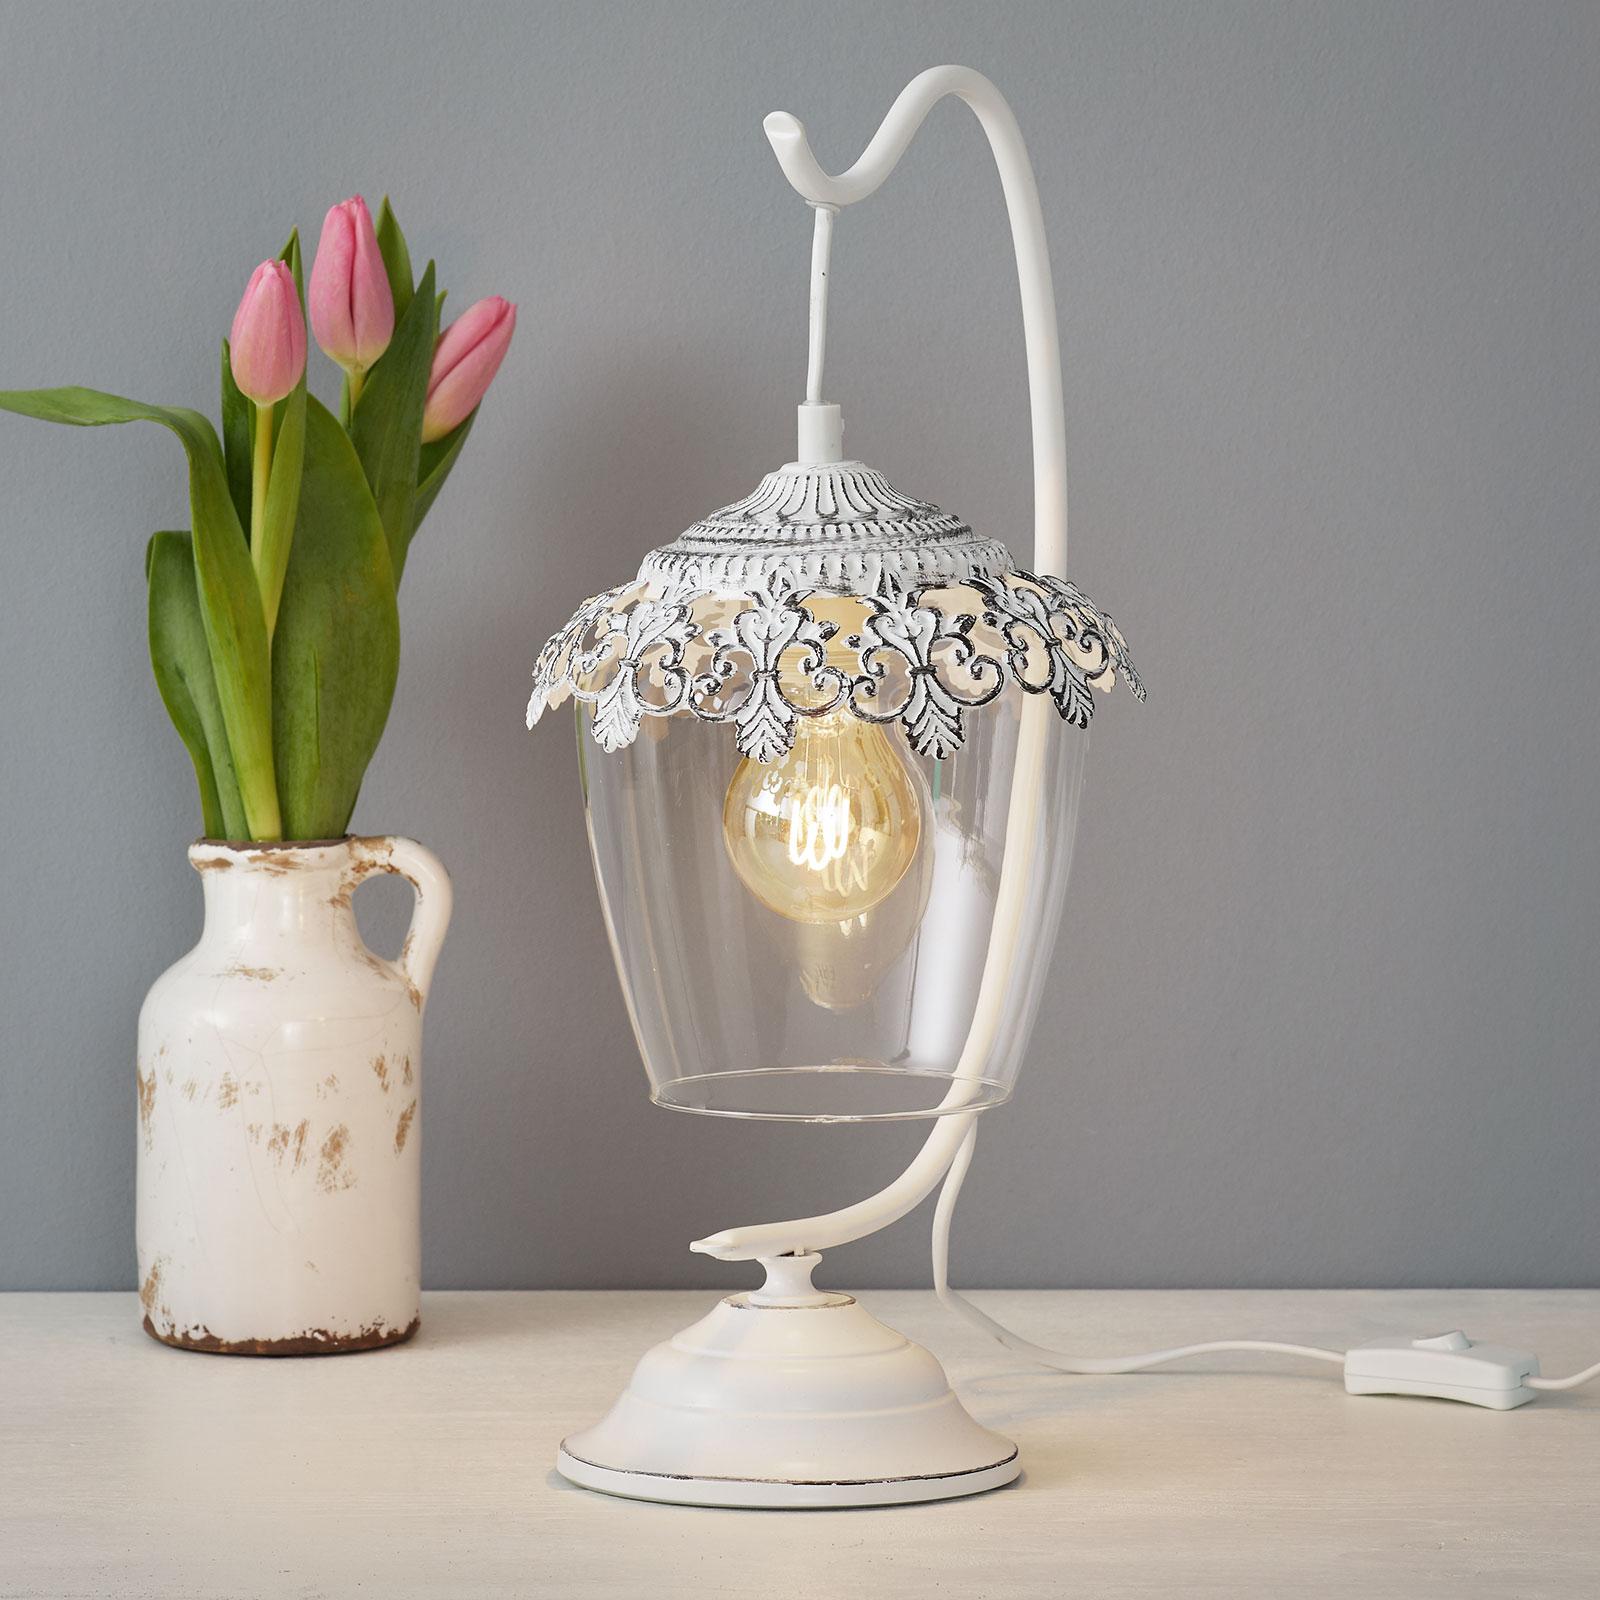 Vitpatinerad bordslampa Florinia